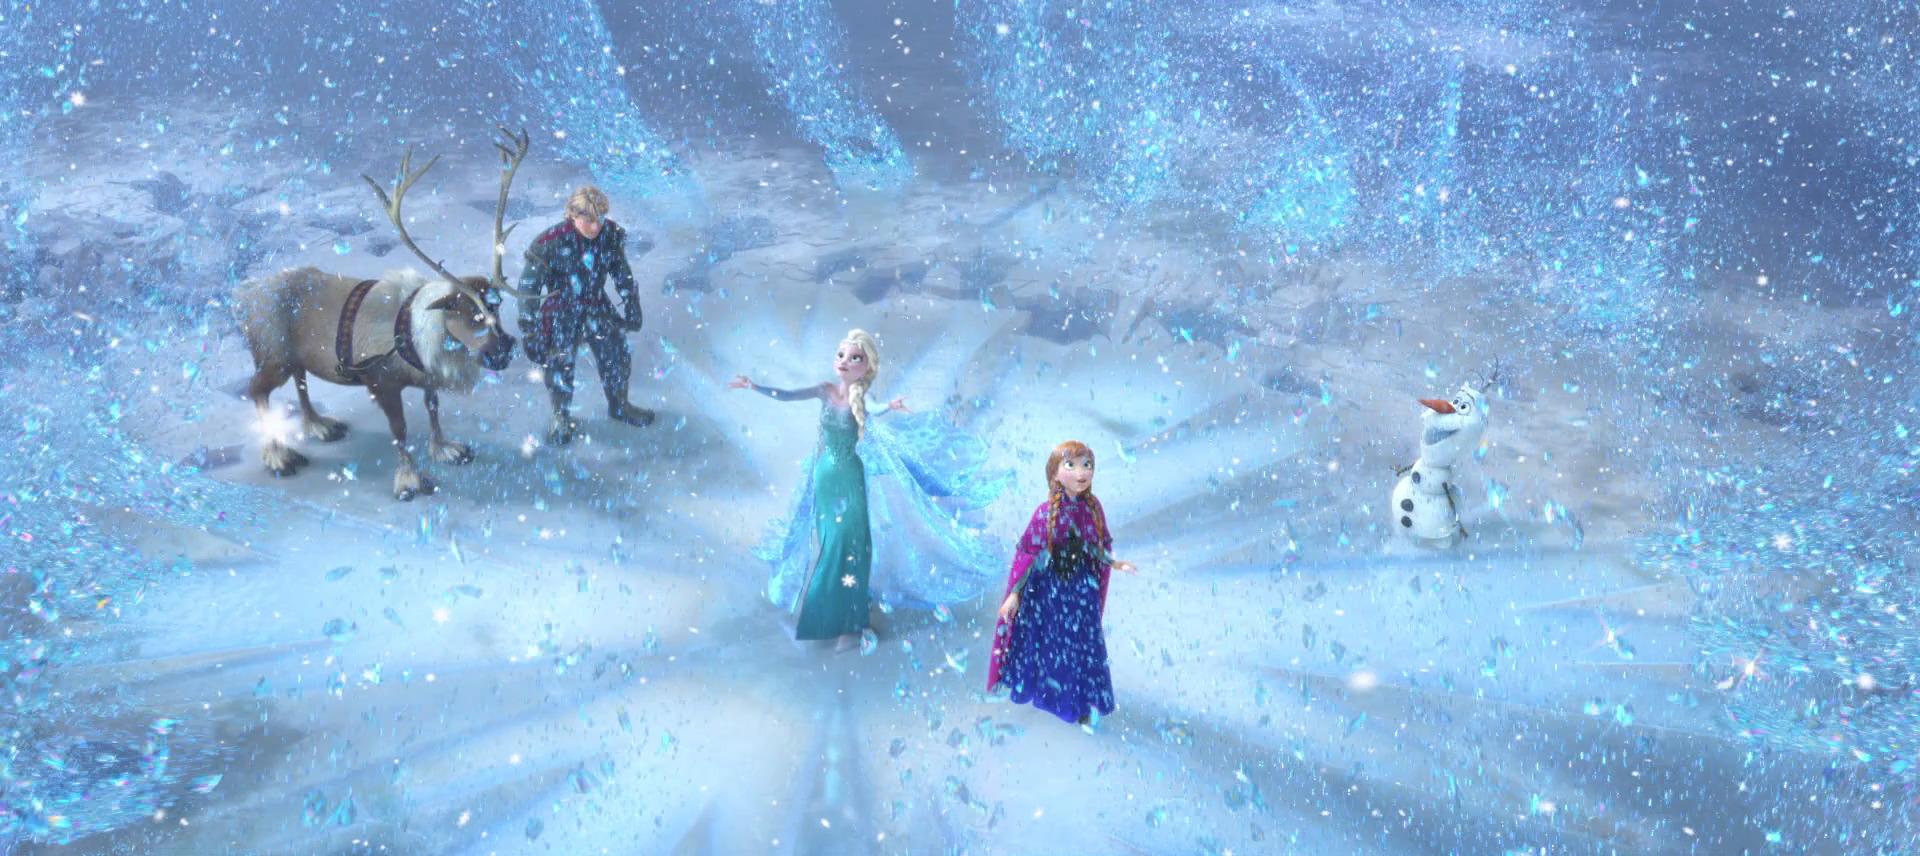 Di Disney Frozen Wall Murals -